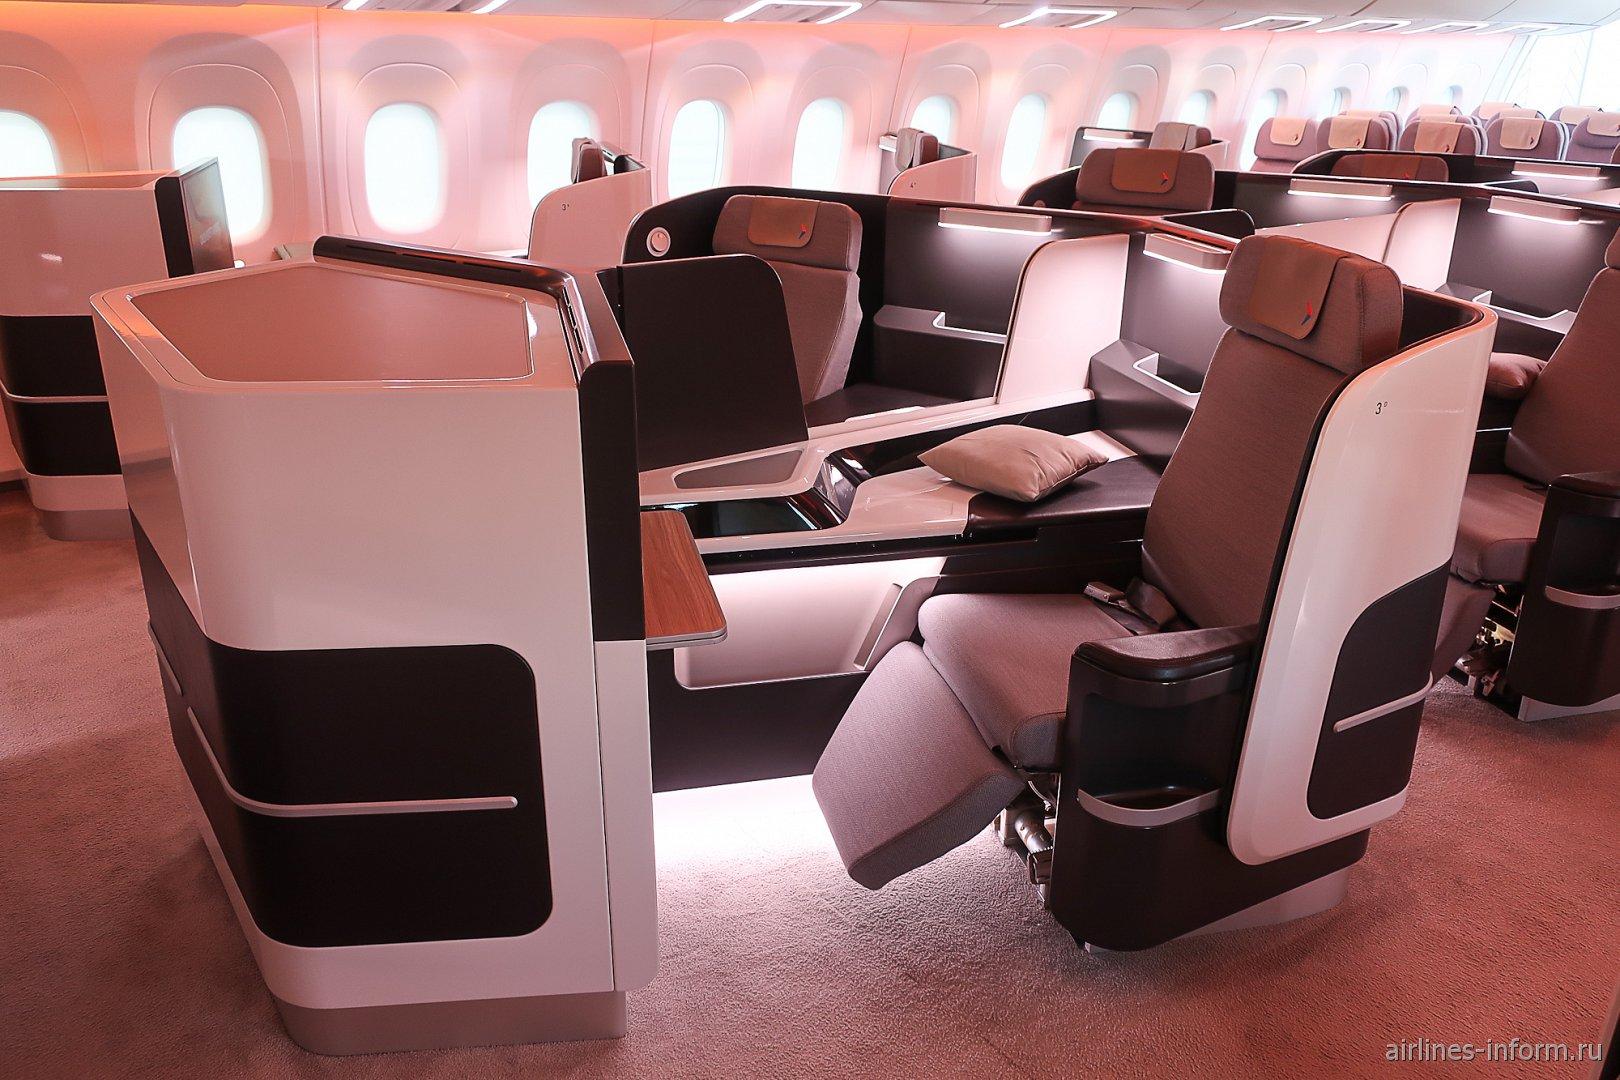 Пассажирский салон бизнес-класса в самолете CR929